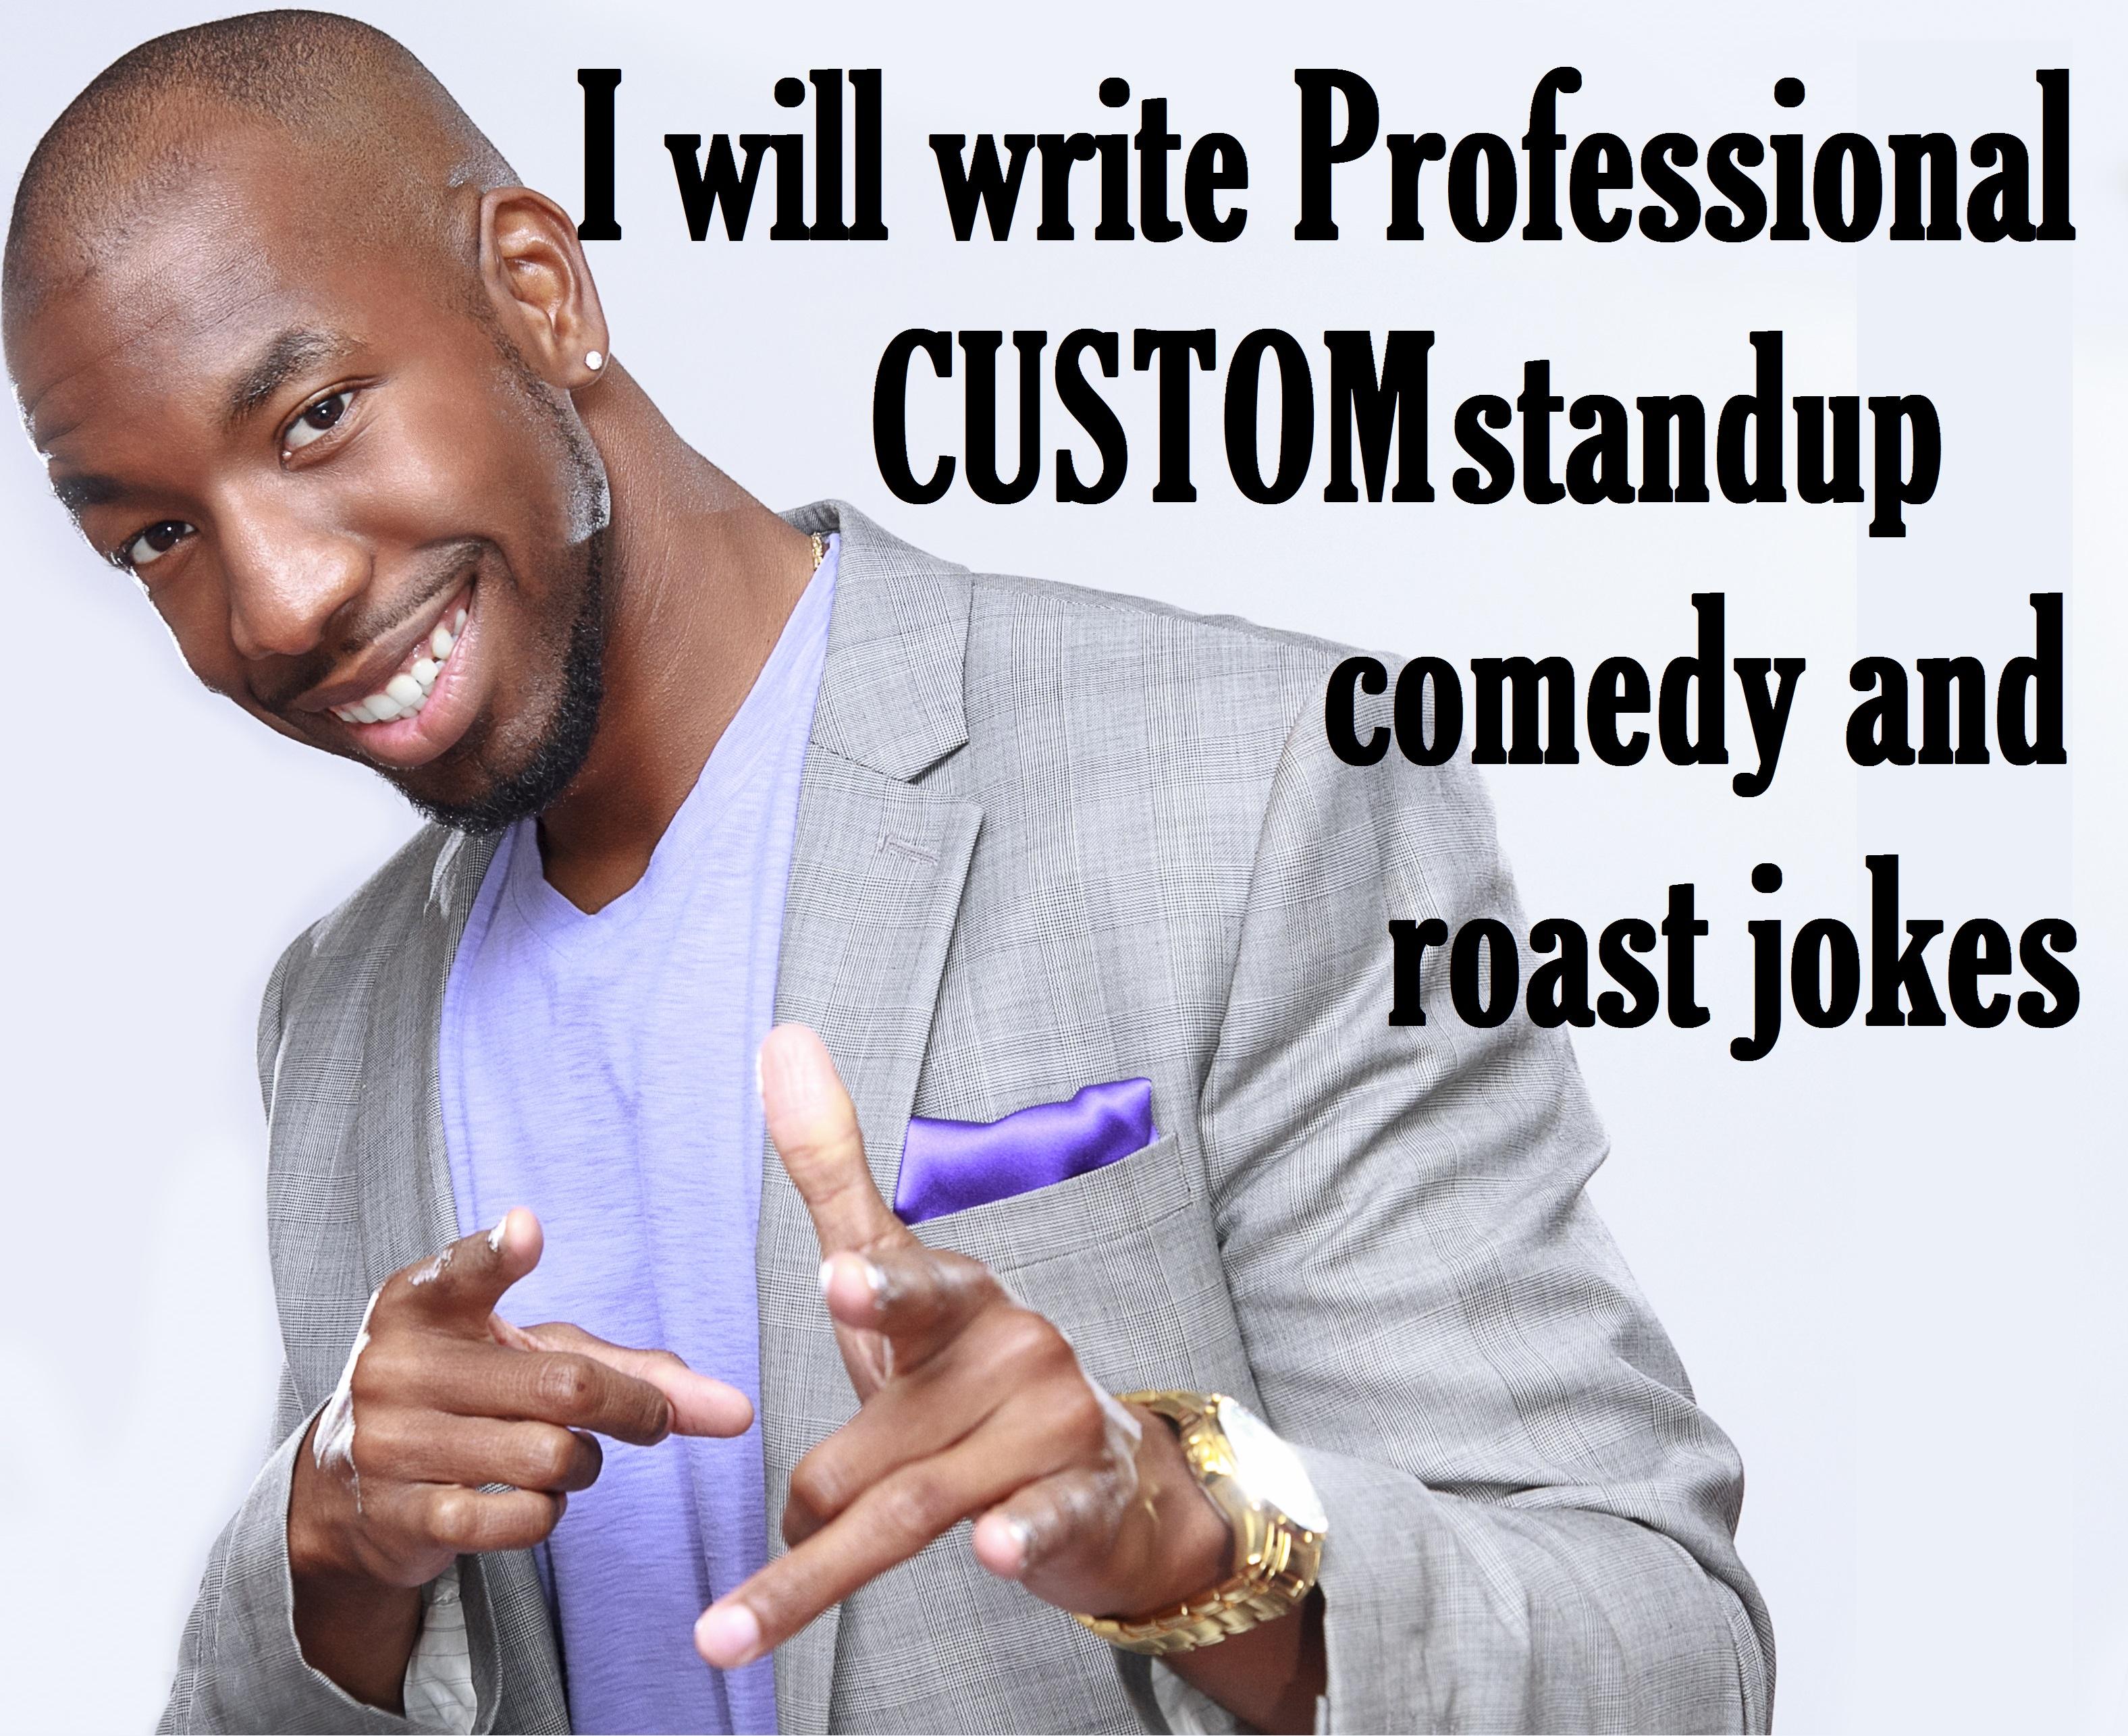 I will write professional custom standup comedy and roast jokes